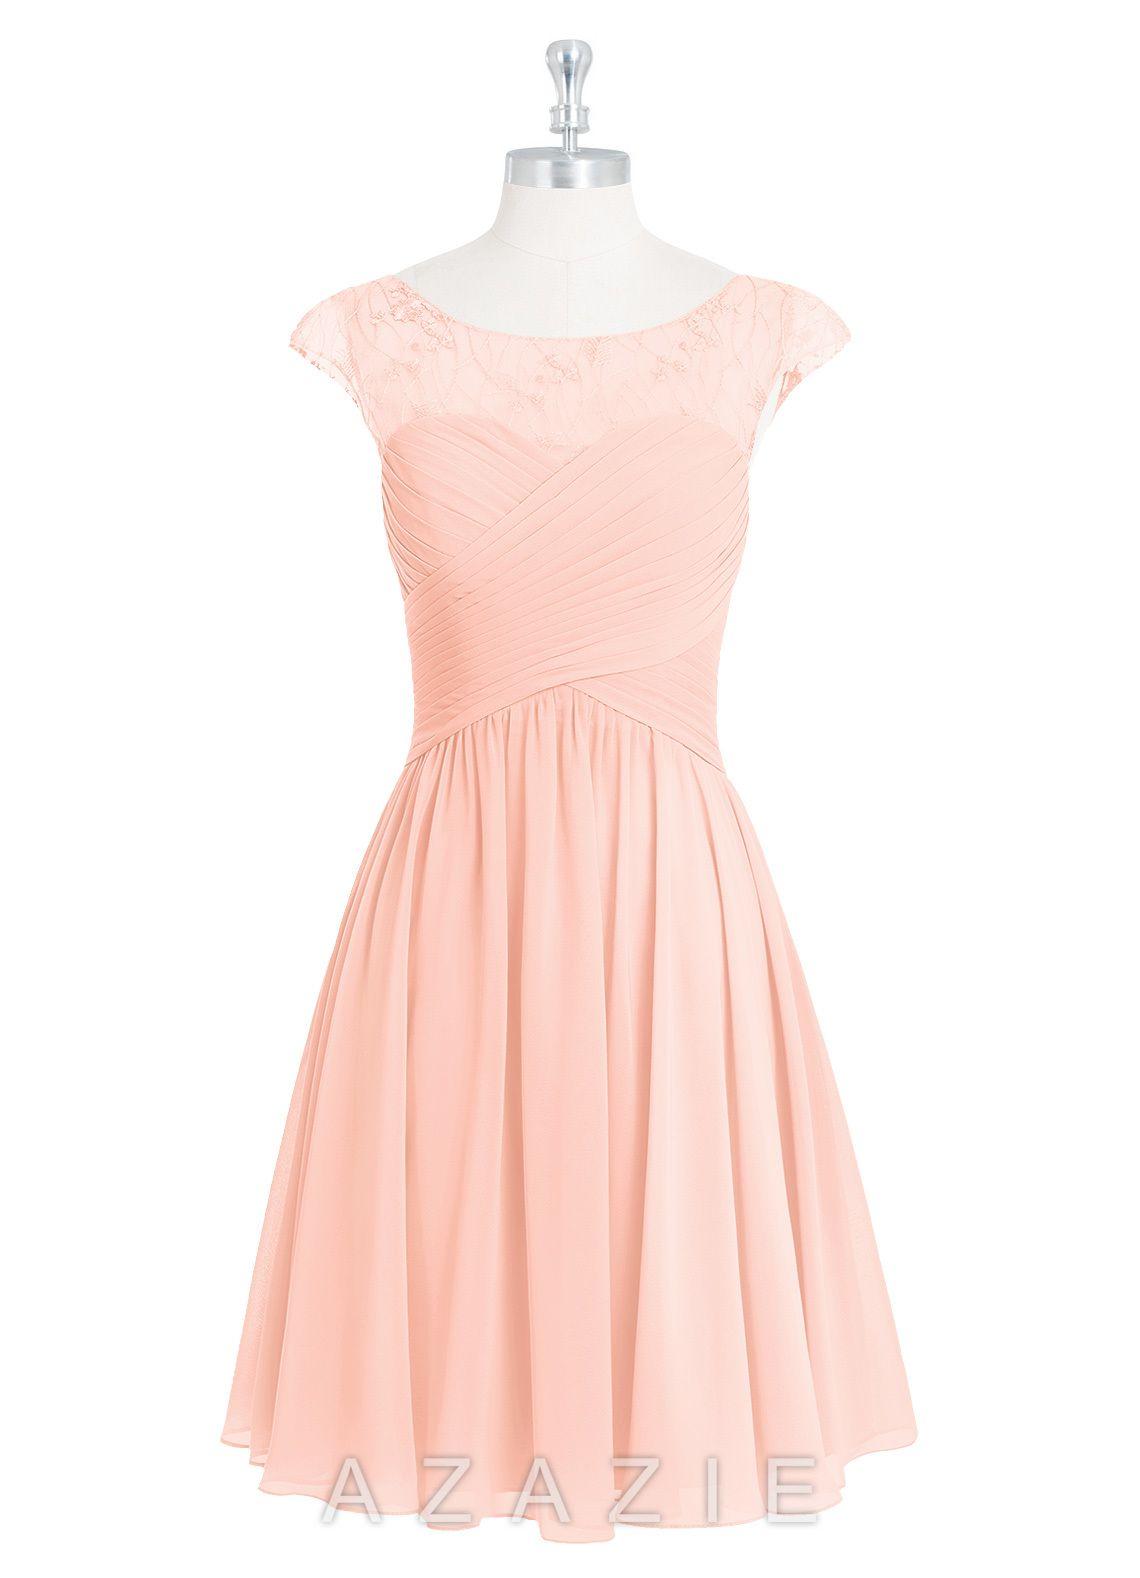 Guava wedding dresses  BETTY  Bridesmaid Dress  Bridal parties and Wedding